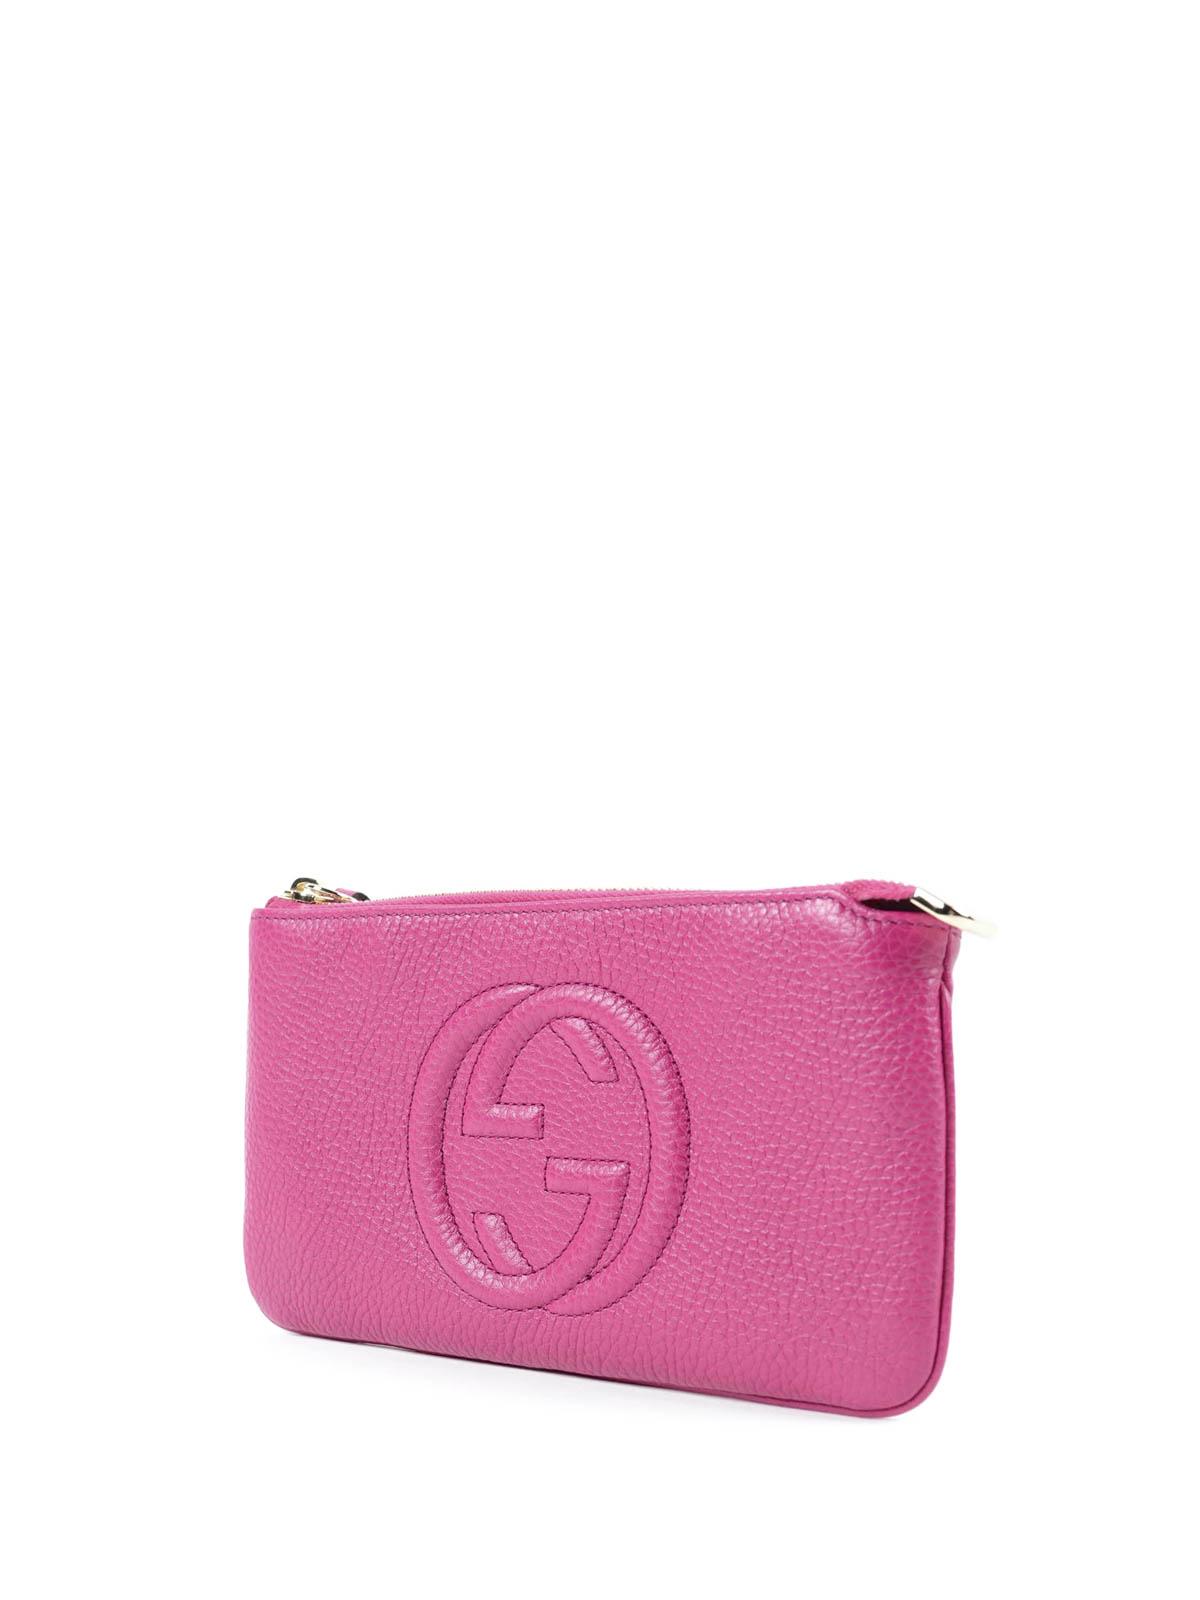 64b19fd01de622 Gucci - Soho leather wallet - wallets & purses - 295840 A7M0G 5523